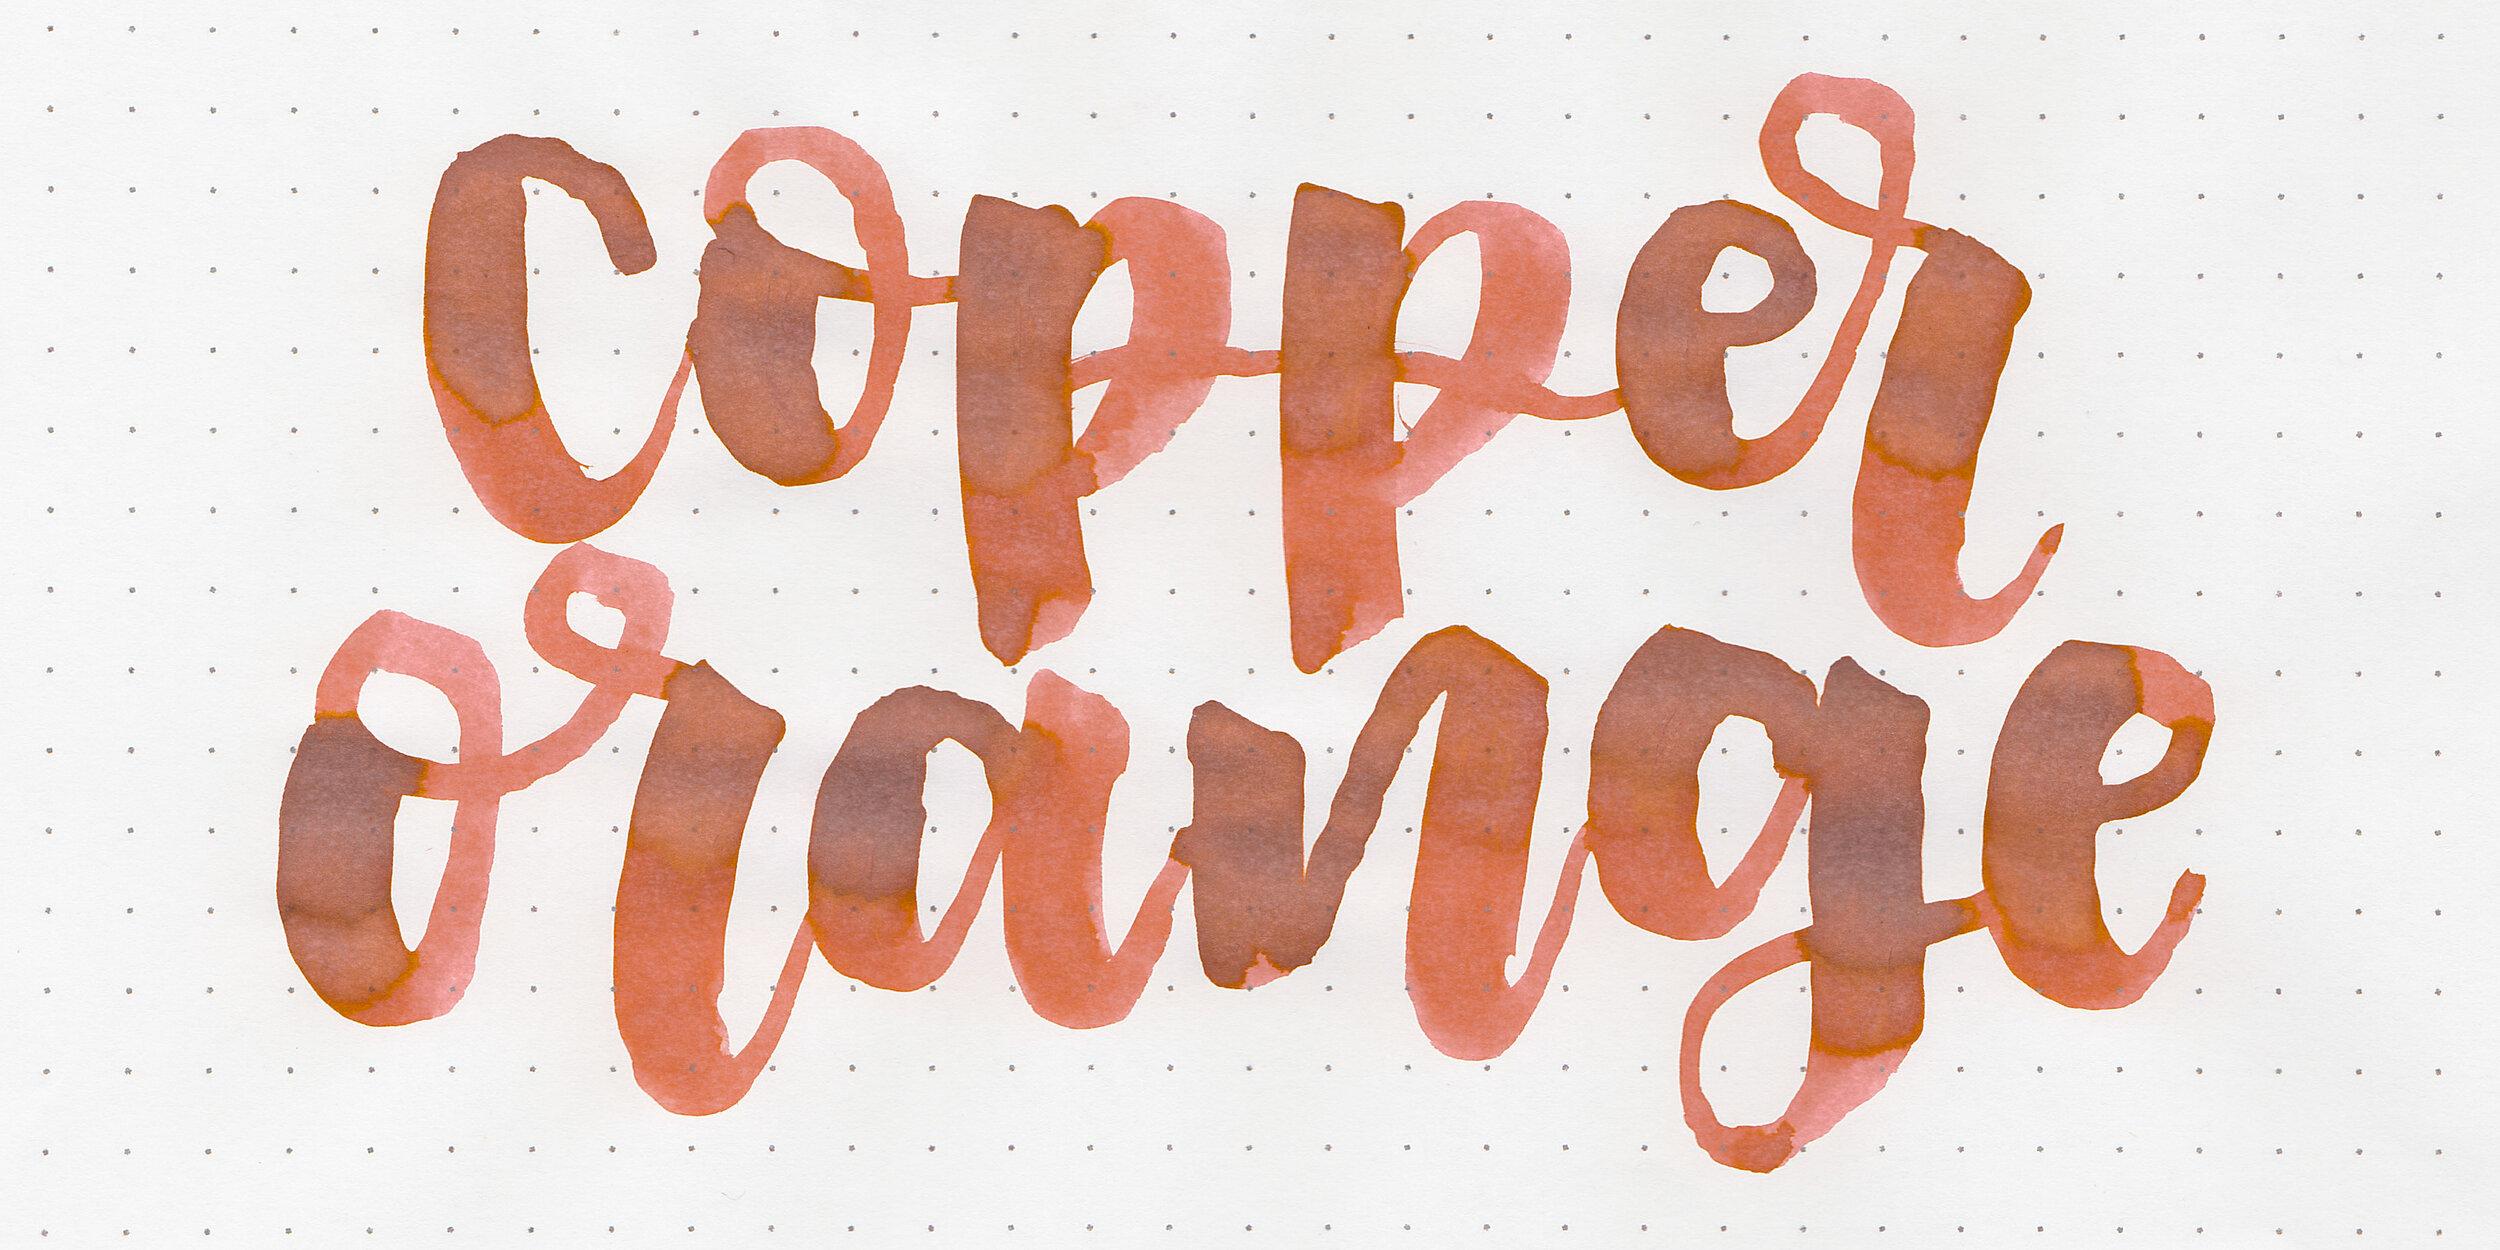 lmy-copper-orange-2.jpg